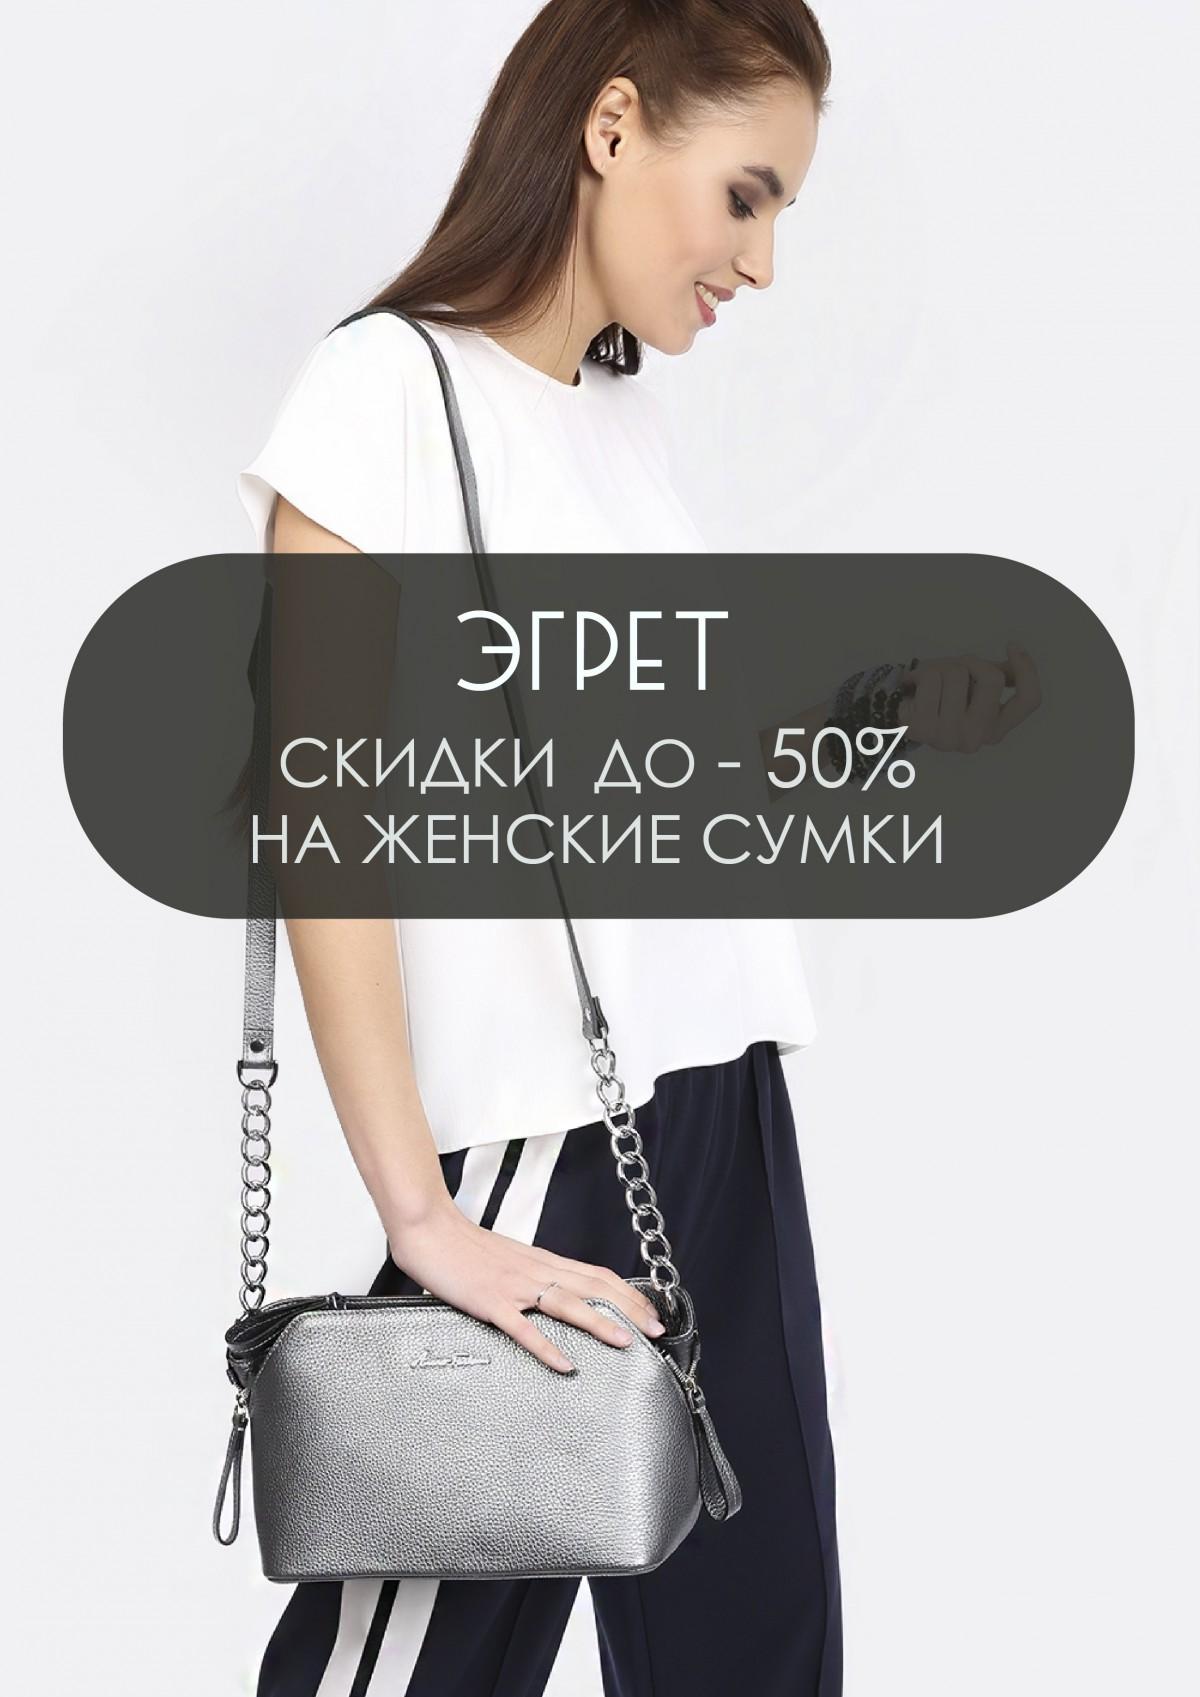 dce73c069ef0 Скидка 50 % на женские сумки!